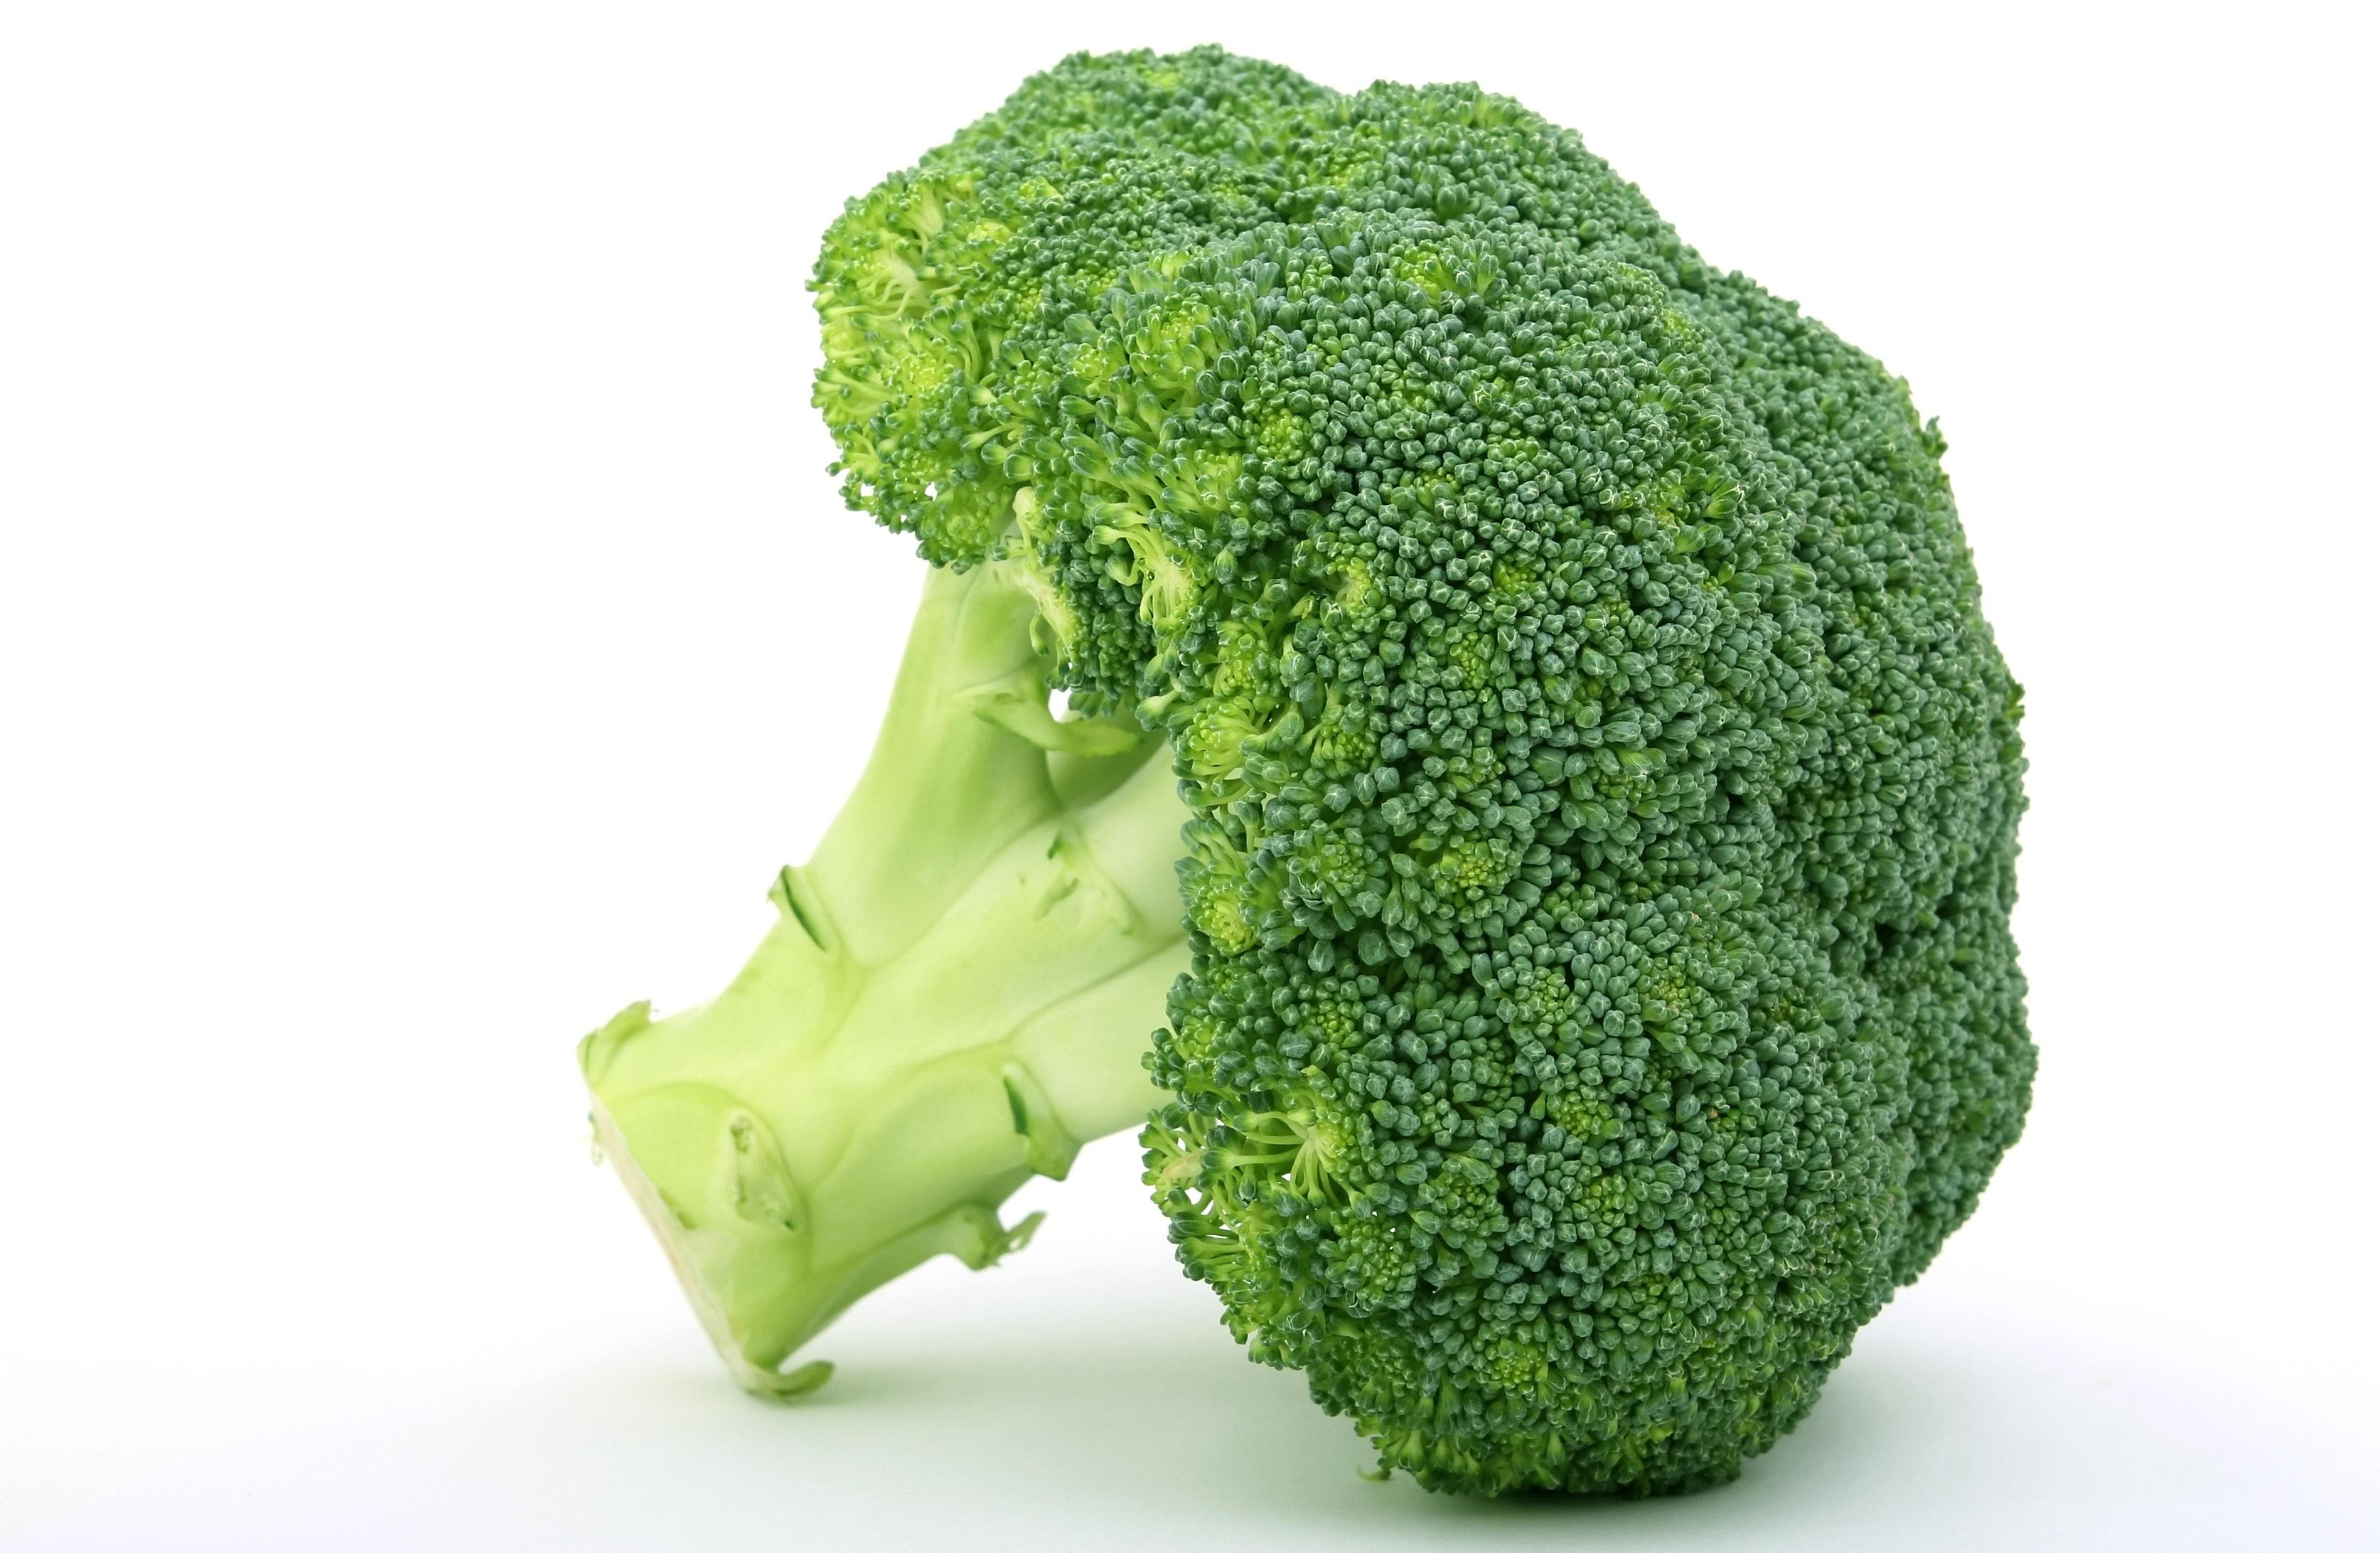 Free stock photo of broccoli, brocoli broccolli, calories